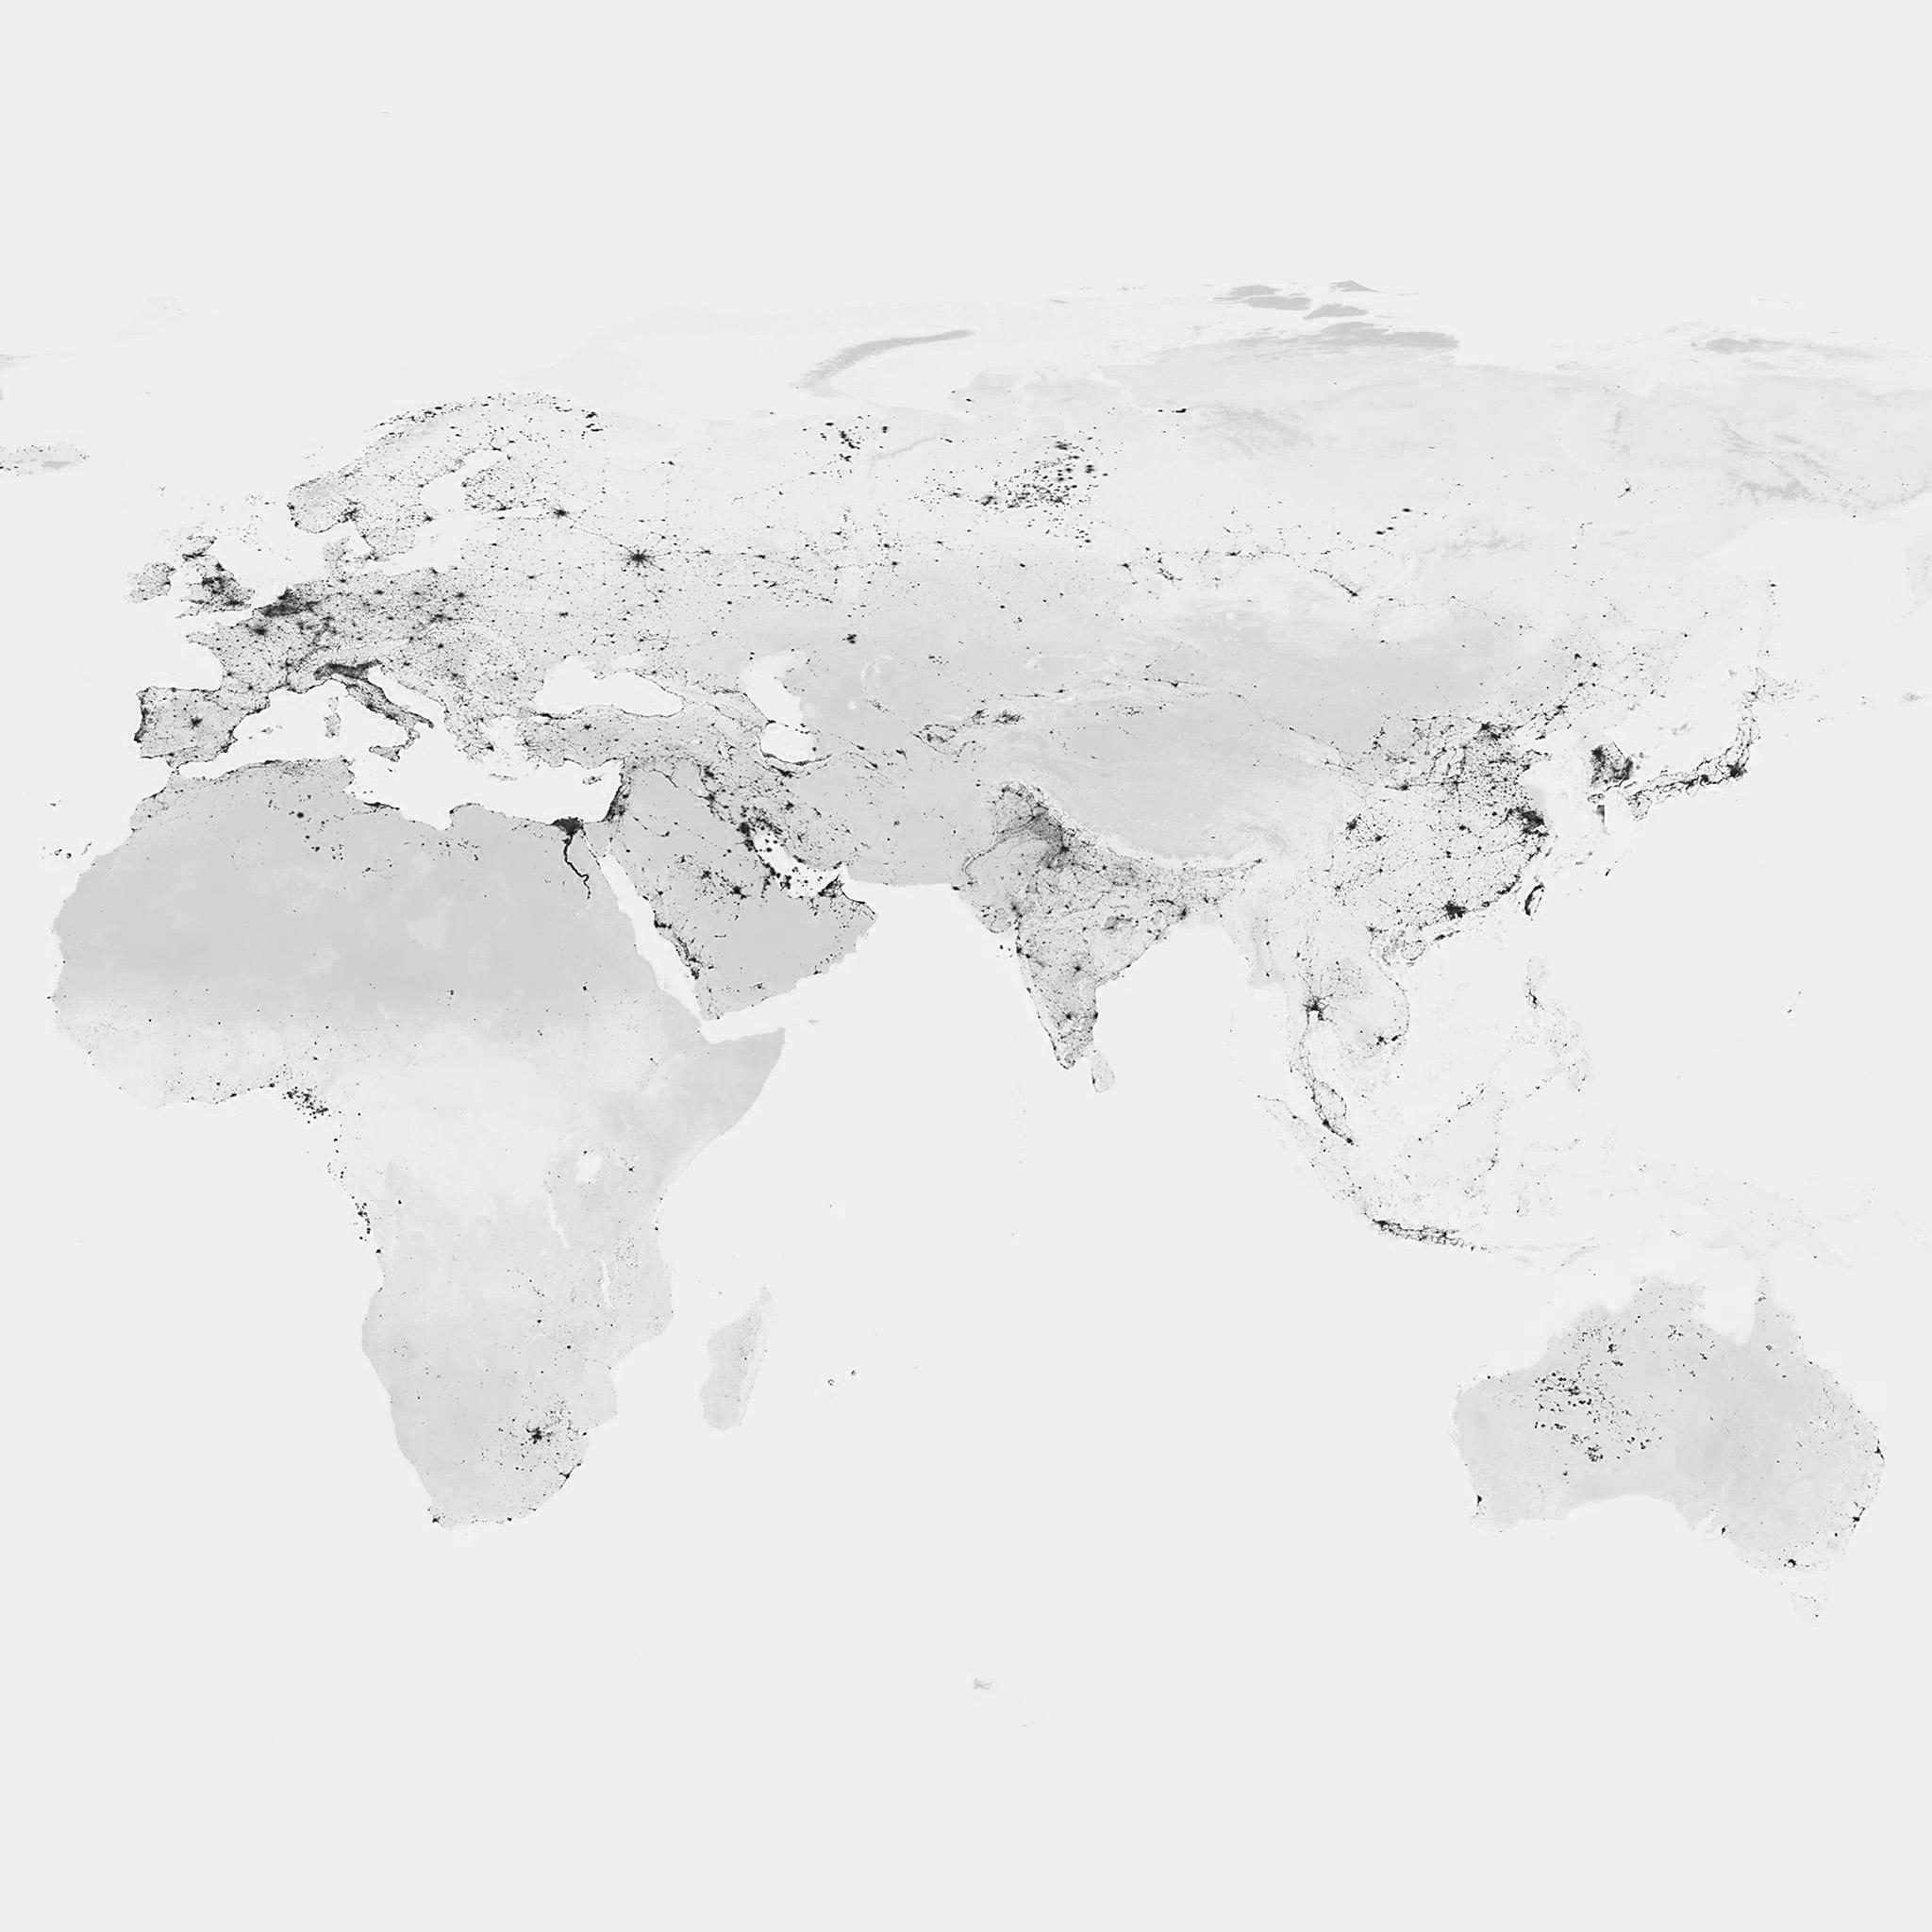 Amworldmapbwdarkearthviewartclear - World map ipad wallpaper